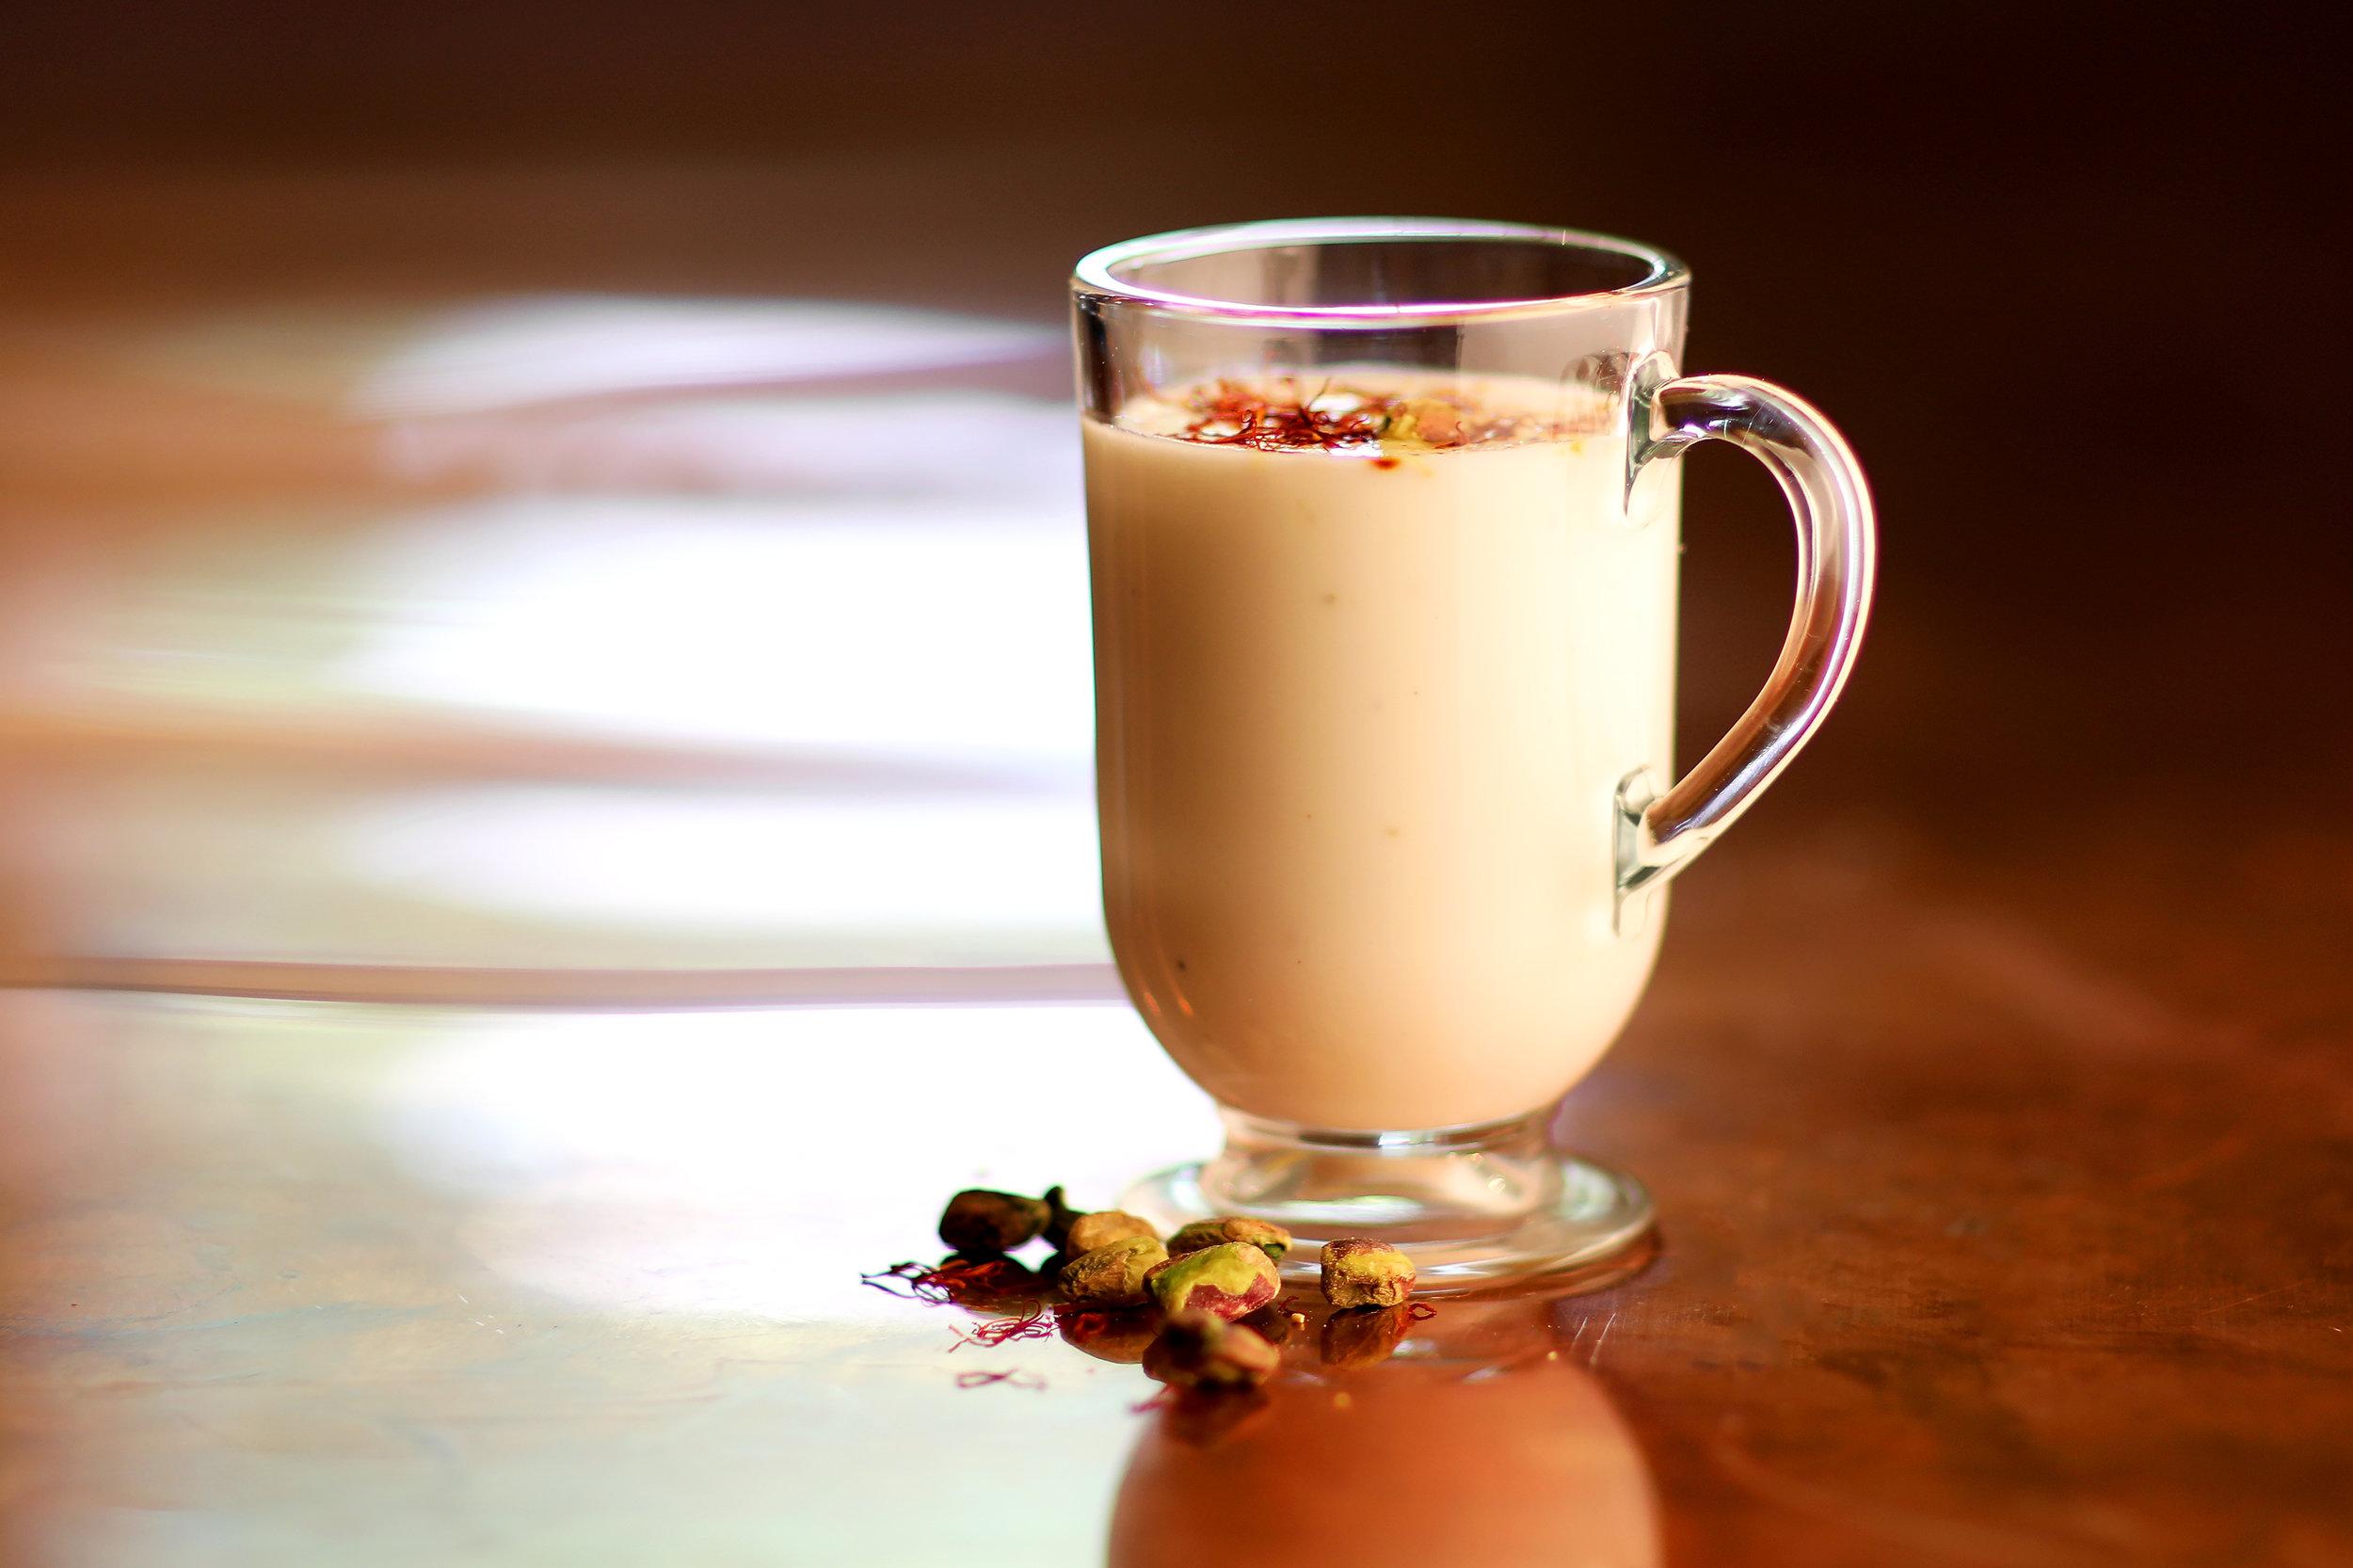 Spice Room-indian-food-cinnamon-rhinebeck-new-york-6.jpg